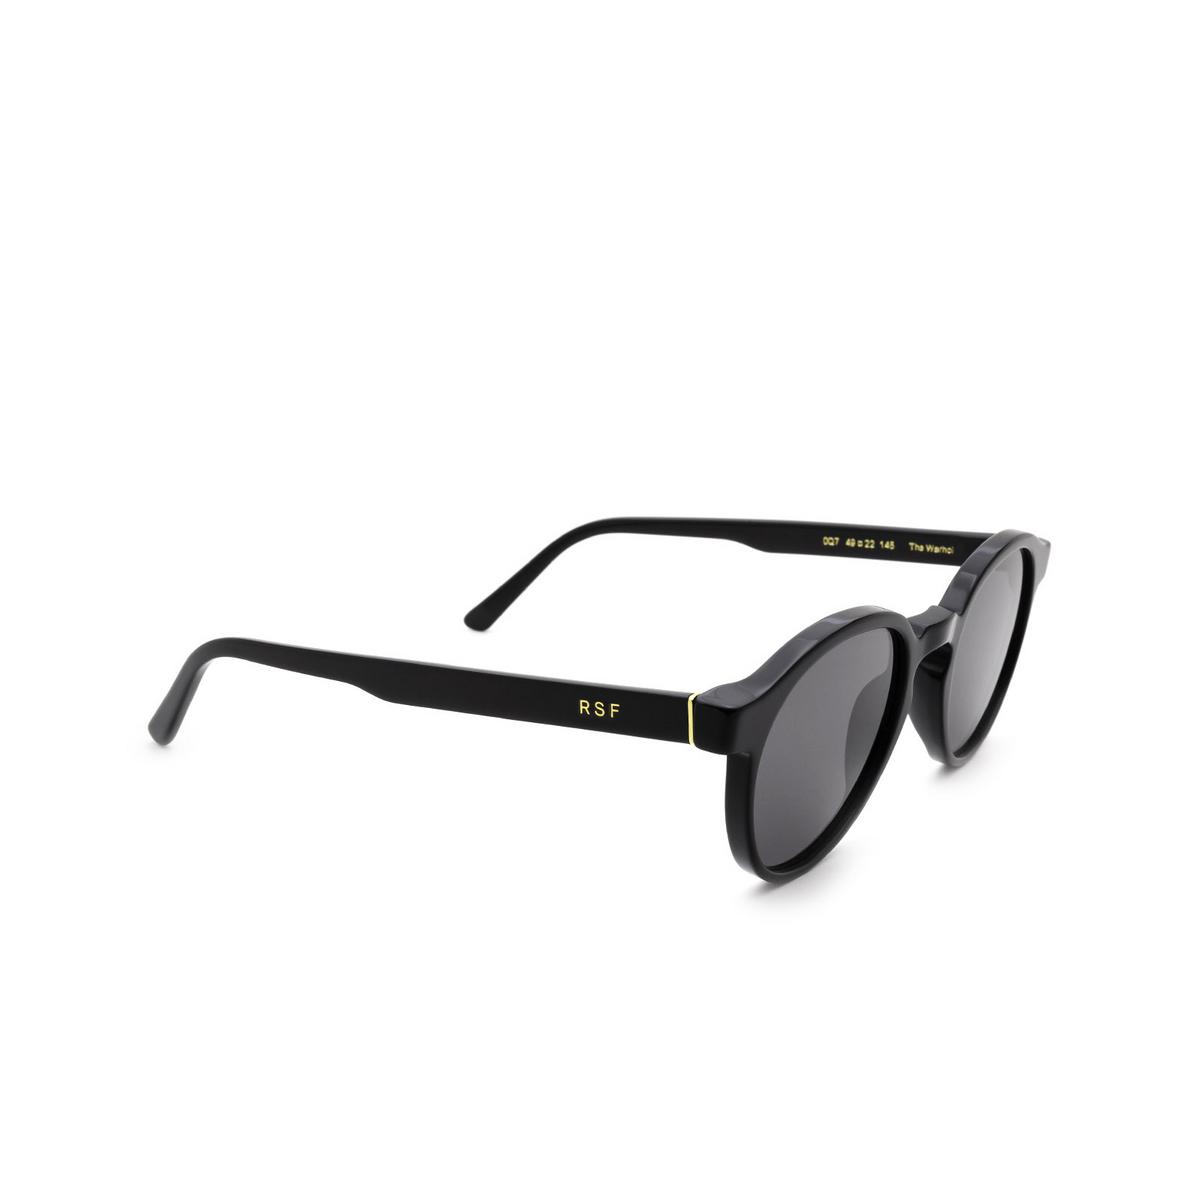 Retrosuperfuture® Round Sunglasses: The Warhol color Black 0Q7 - three-quarters view.